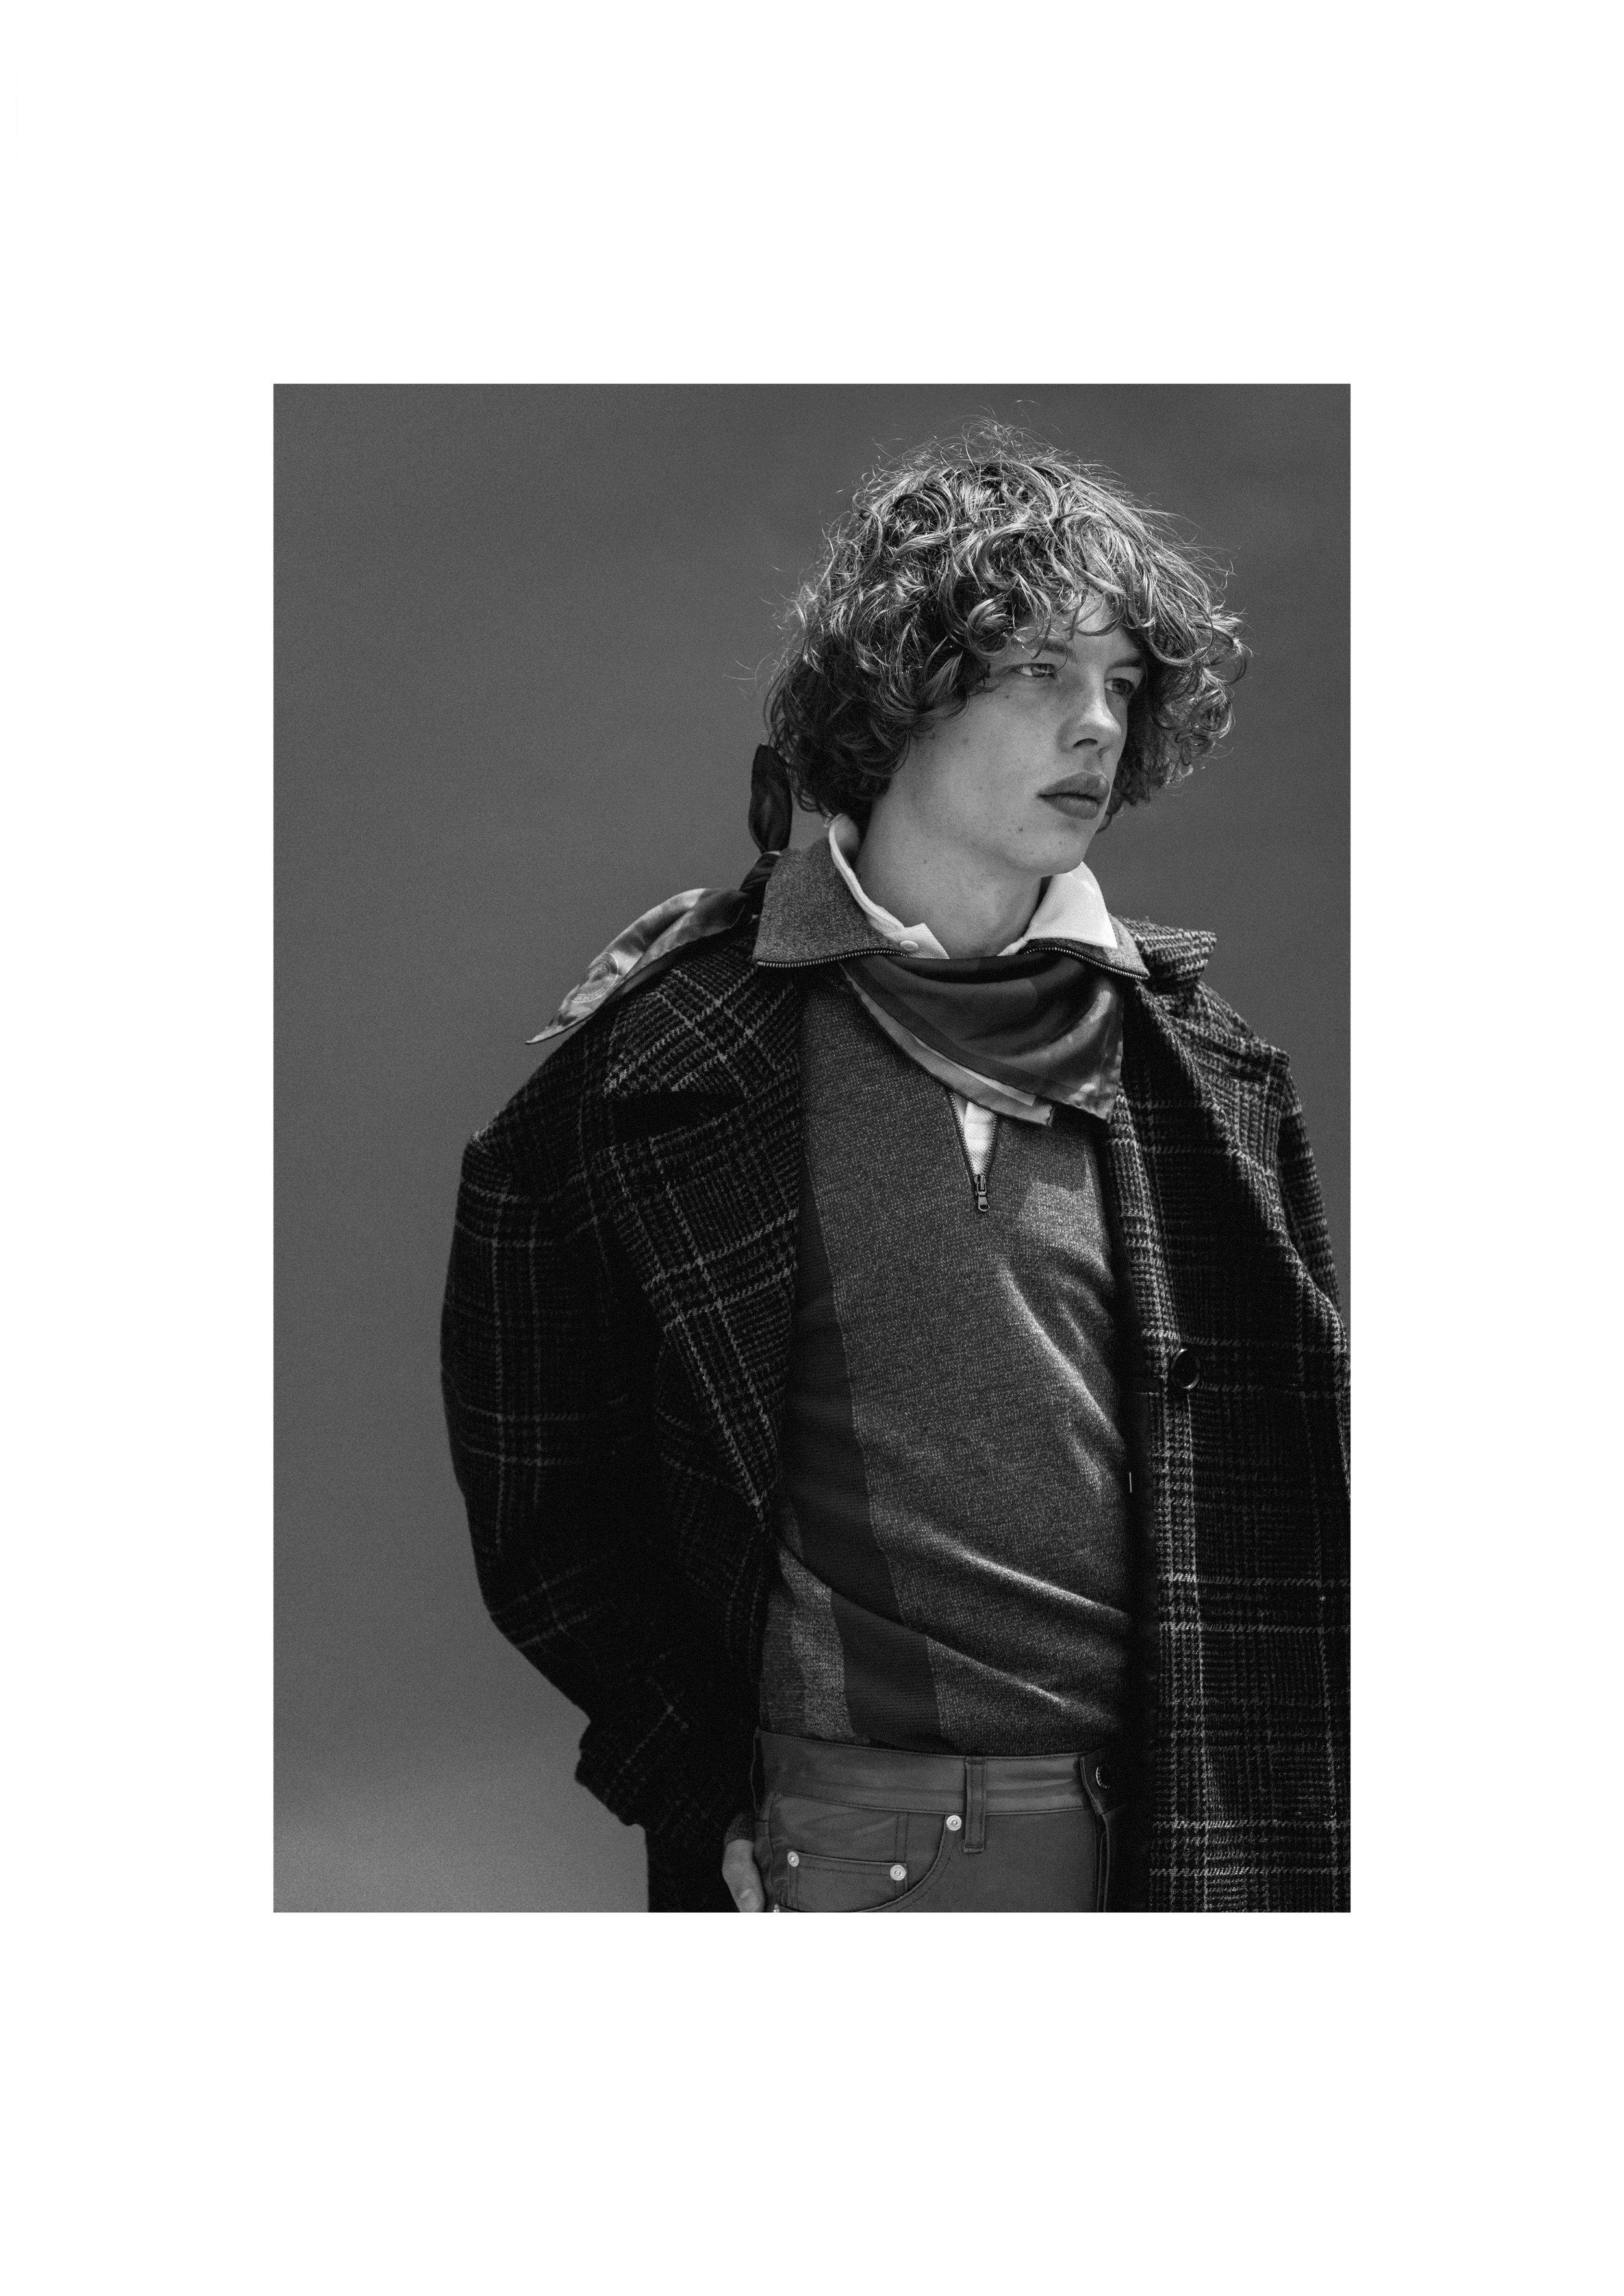 Coat - John Lawrence Sullivan Half Zip - Pringle of Scotland Polo Shirt - Sunspel Scarf - Sunspel Jeans - John Lawrence Sullivan